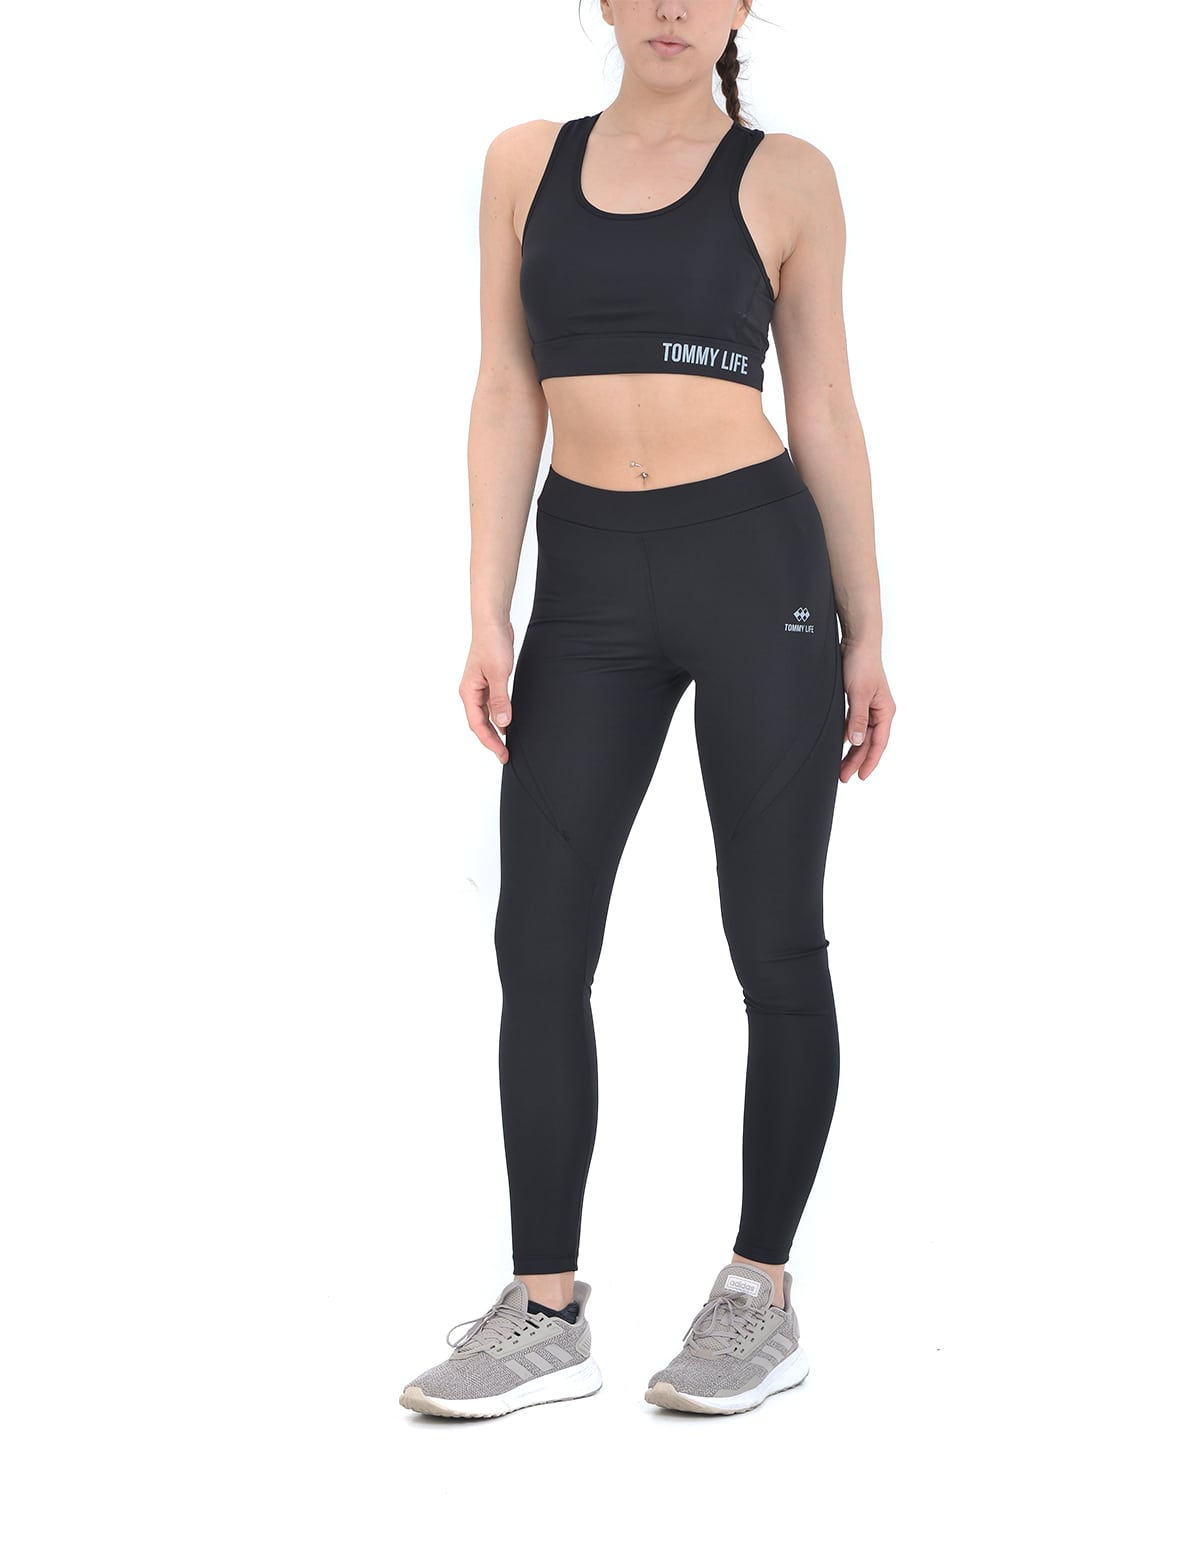 71c19f745810 Αθλητικό σετ μπουστάκι και κολάν σε μαύρο χρώμα - vactive.gr